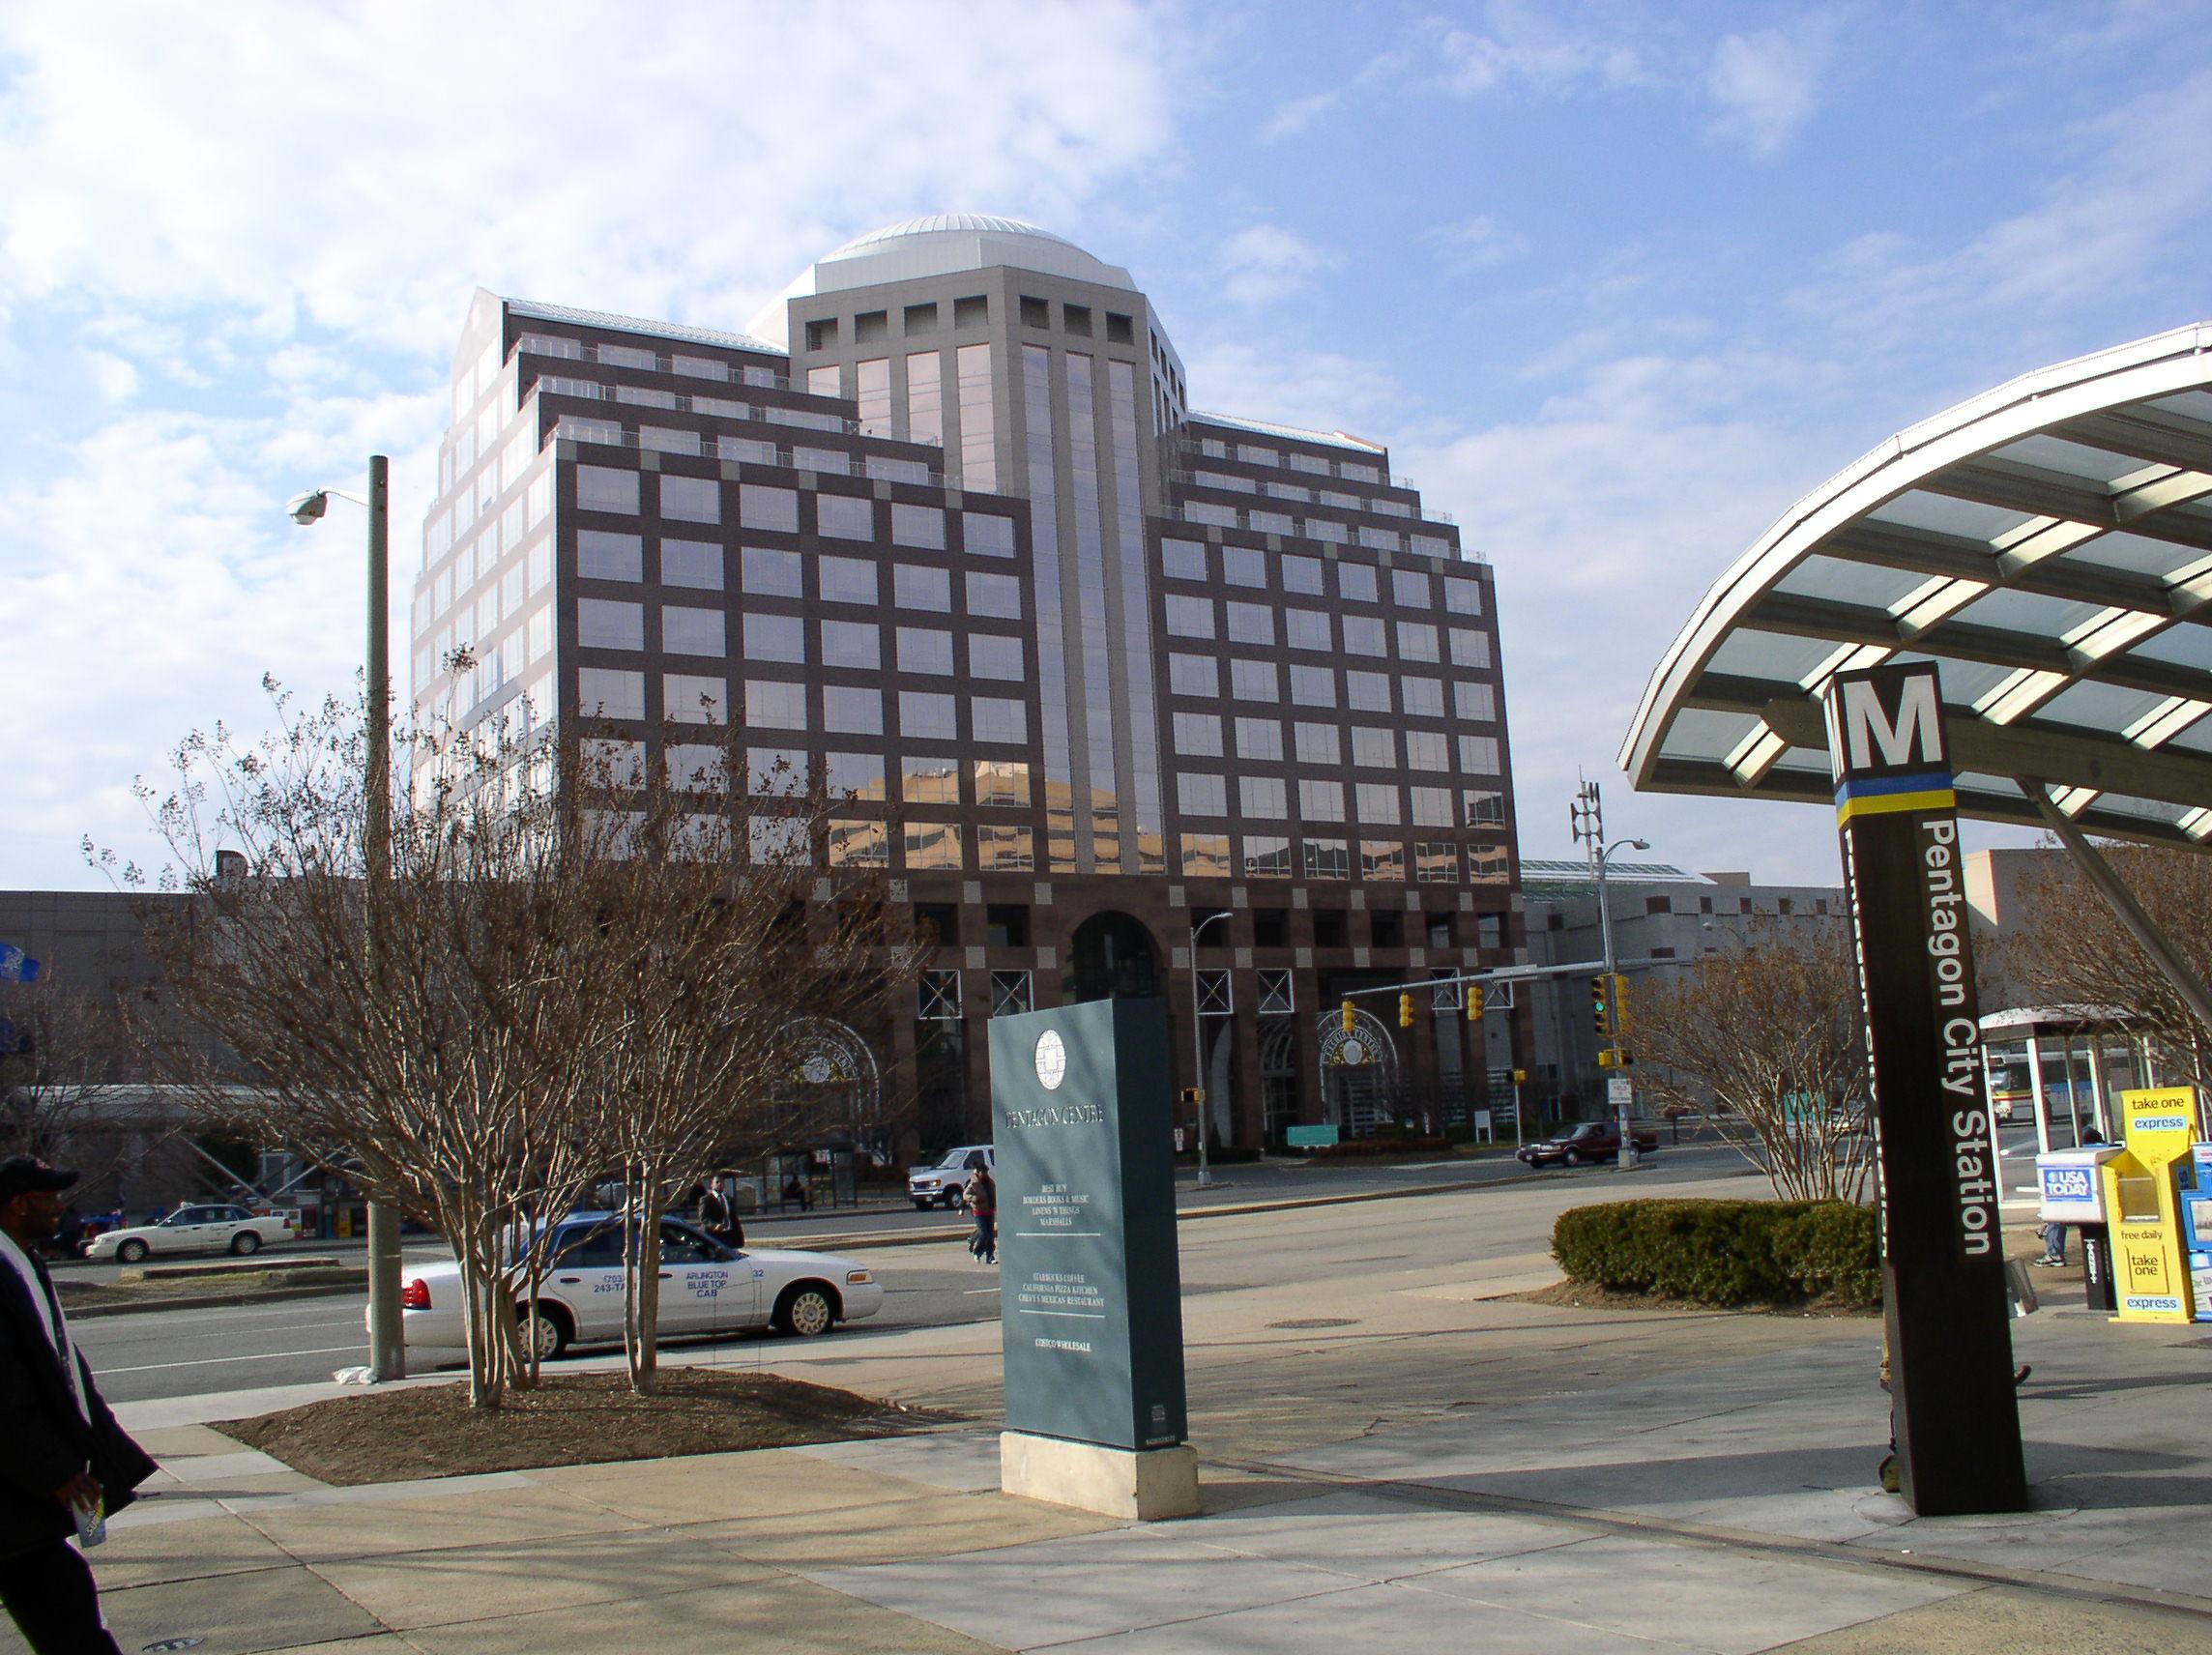 5 Shopping Destinations near Crystal City